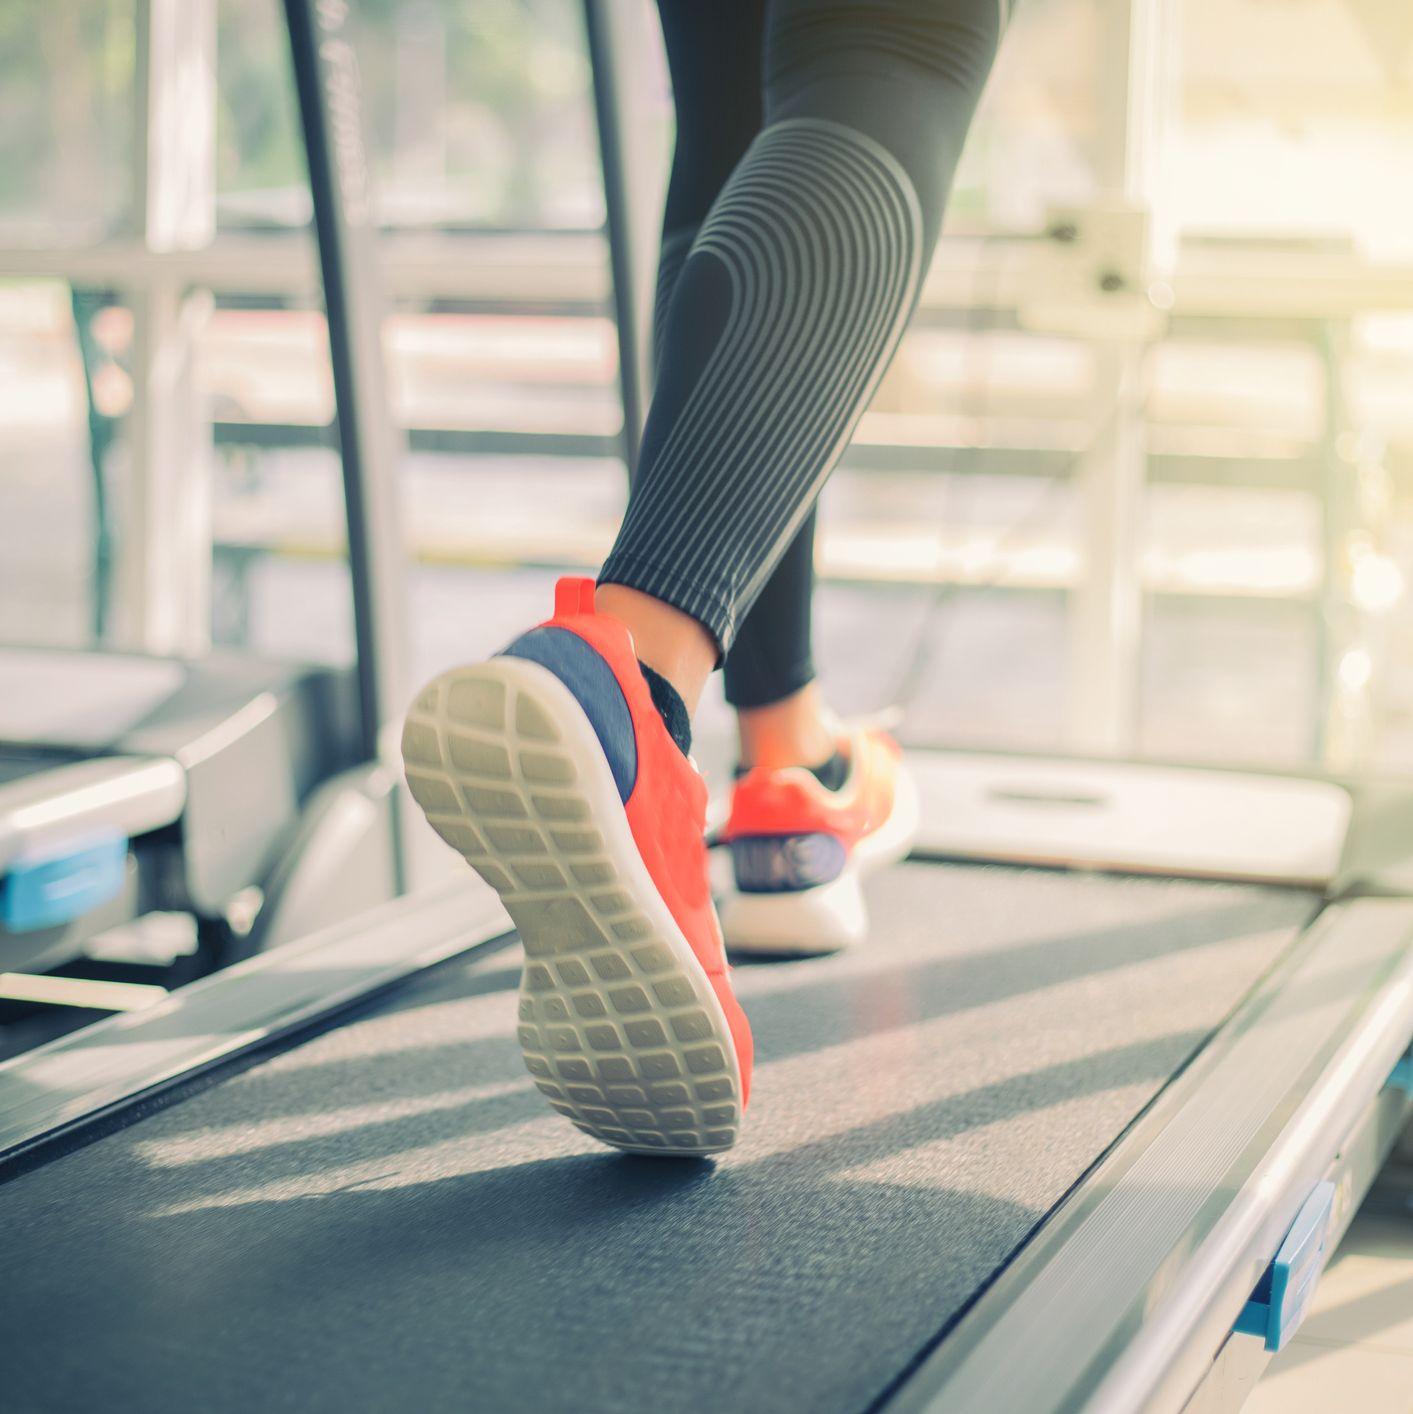 Elliptical Vs. Treadmill: Which Is A Better Cardio Machine?